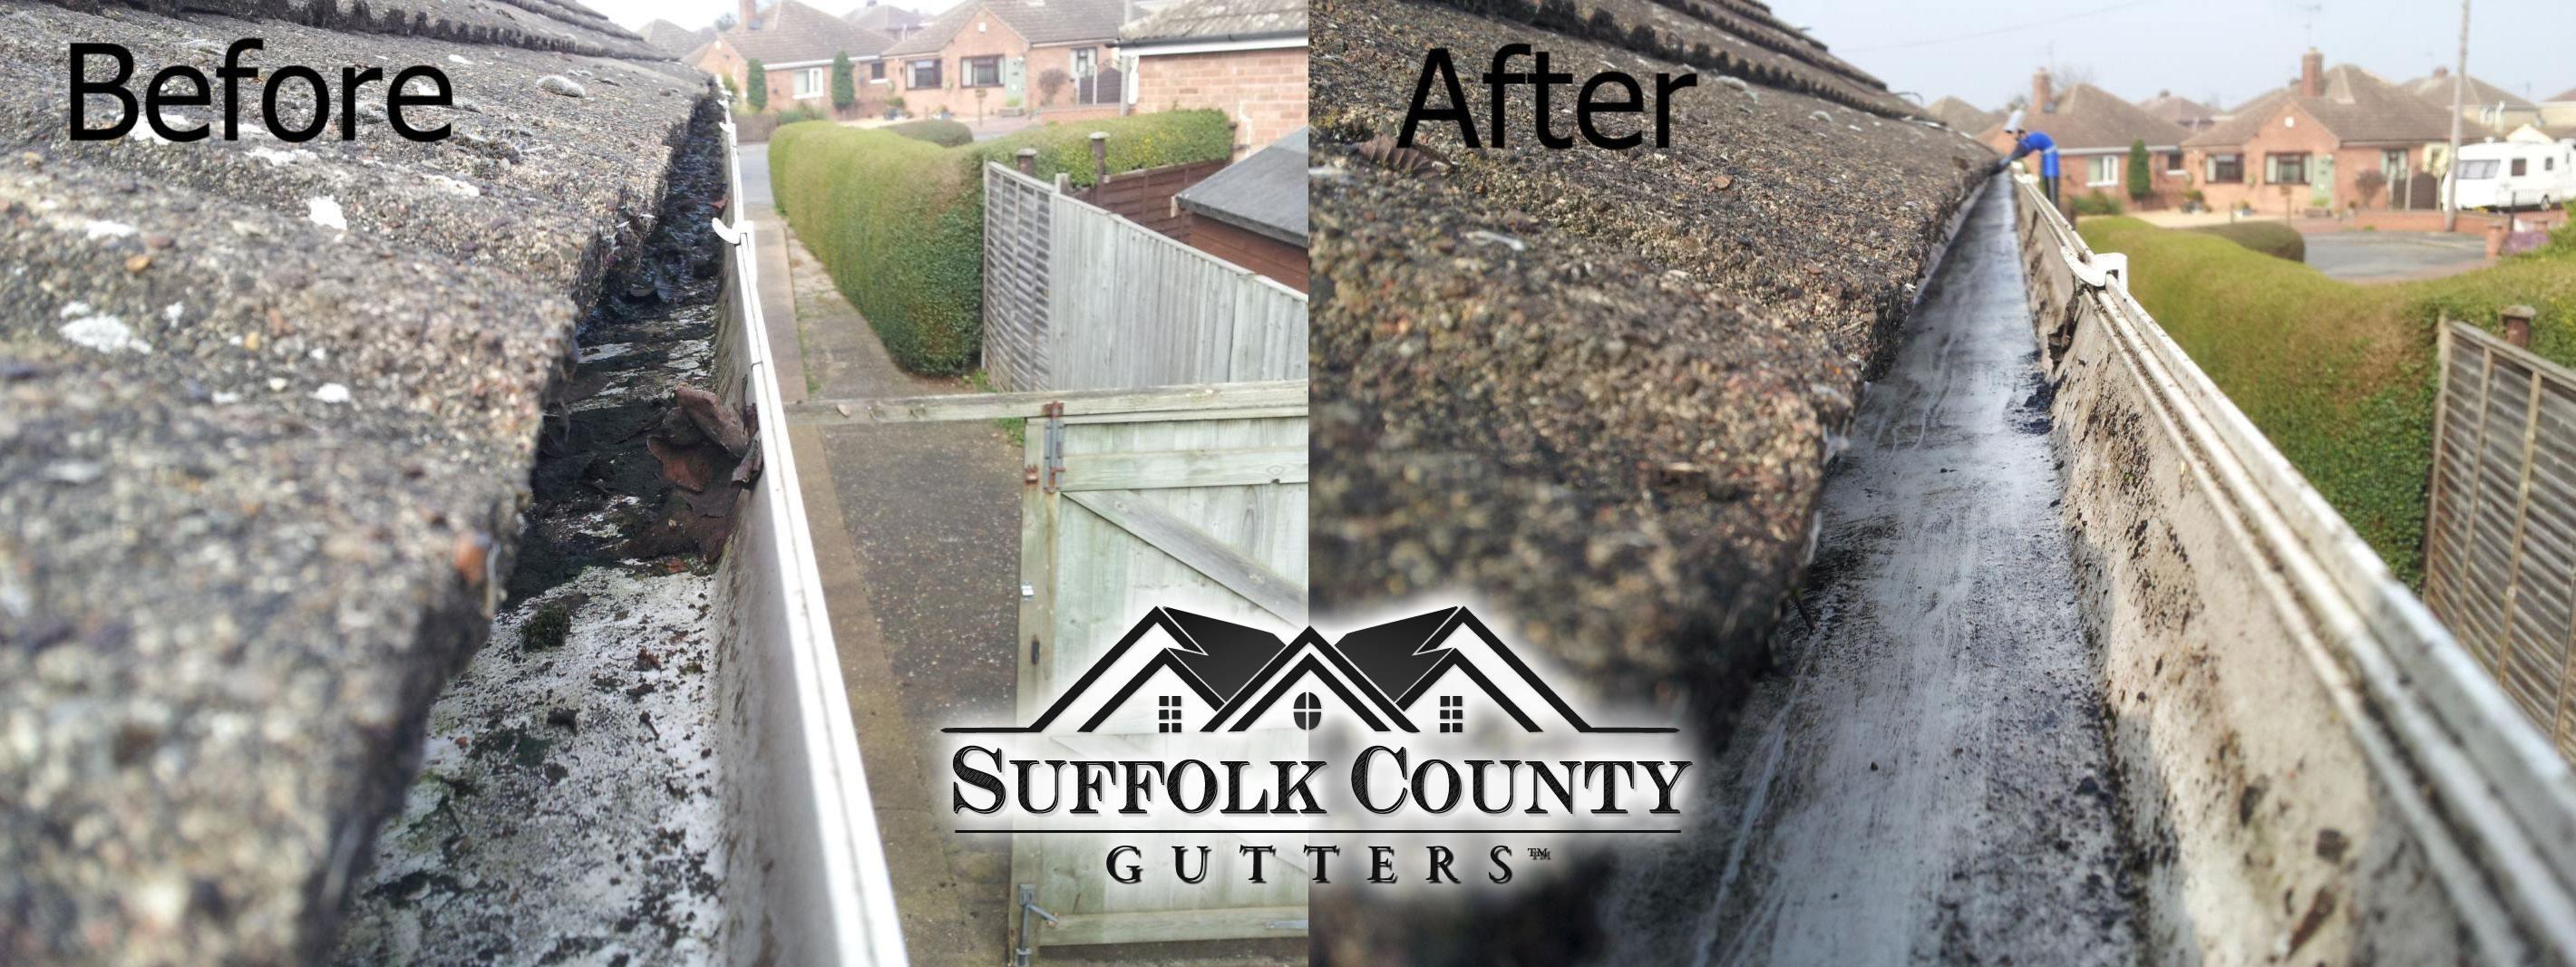 Gutter Cleaning Long Island Gutter Contractor